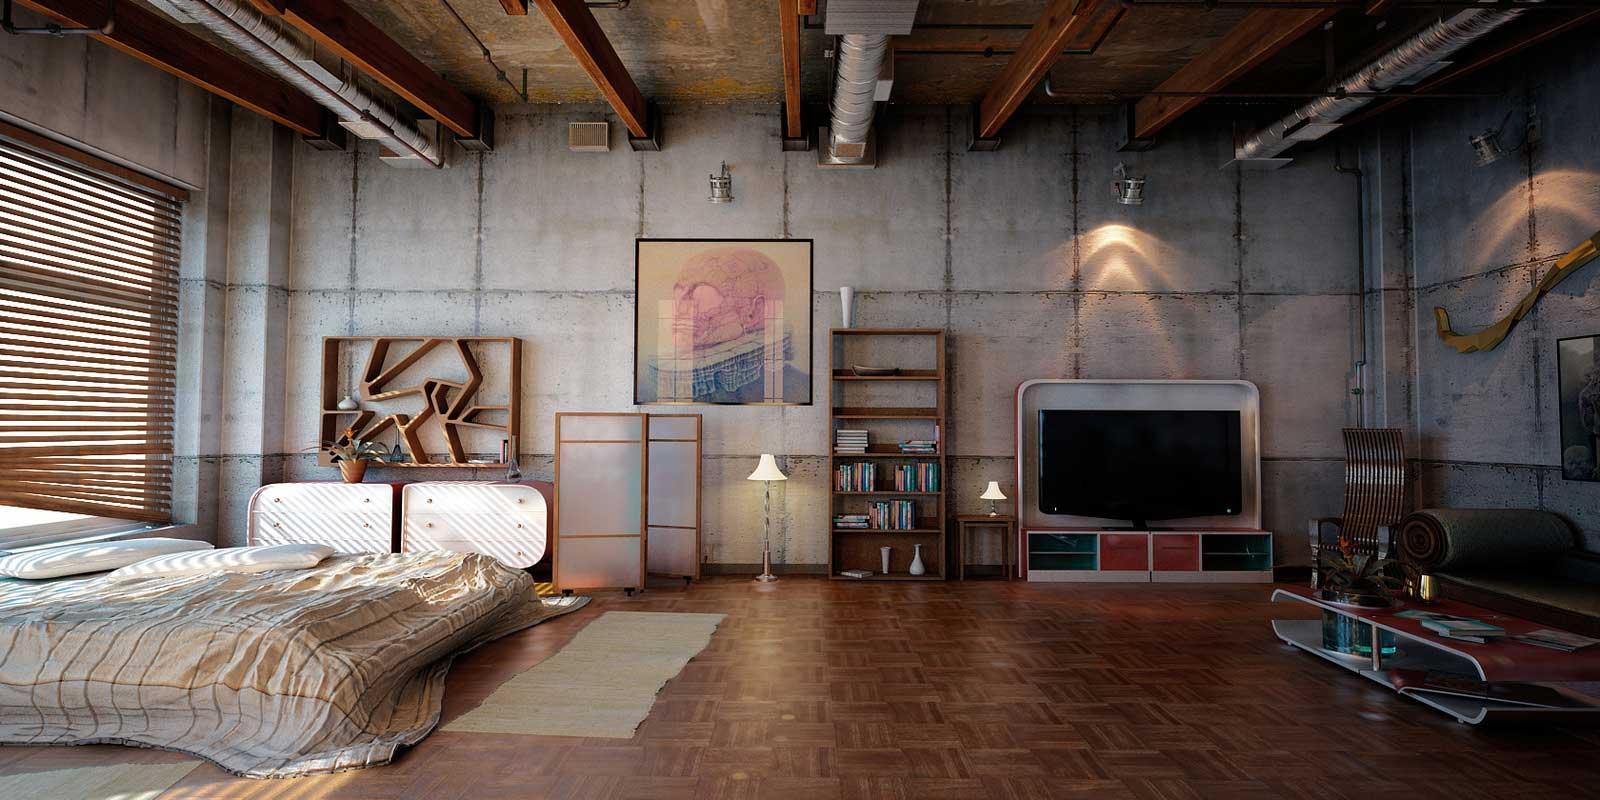 Bien-aimé 35 lofts industriels créés avec un logiciel de rendu 3D RQ58